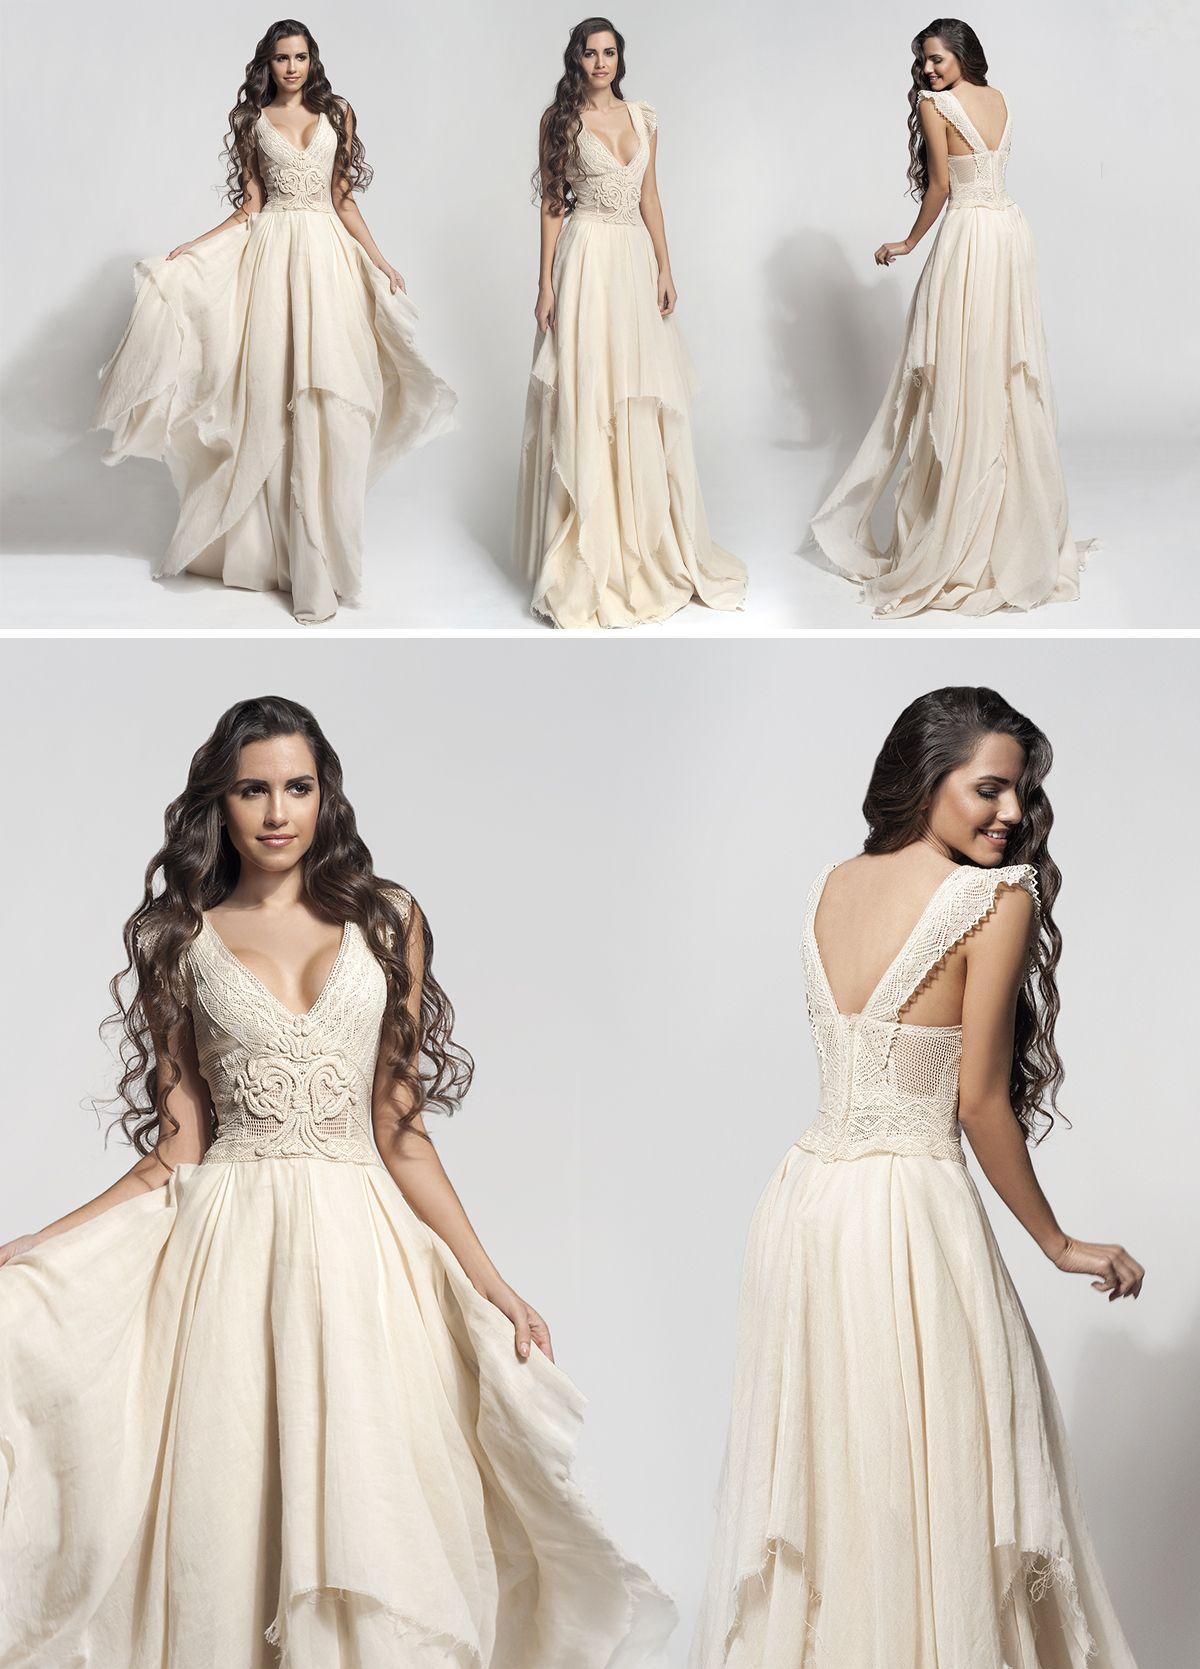 Wedding Dress Ideas | Pinterest | Vintage weddings, Bridal gowns and ...